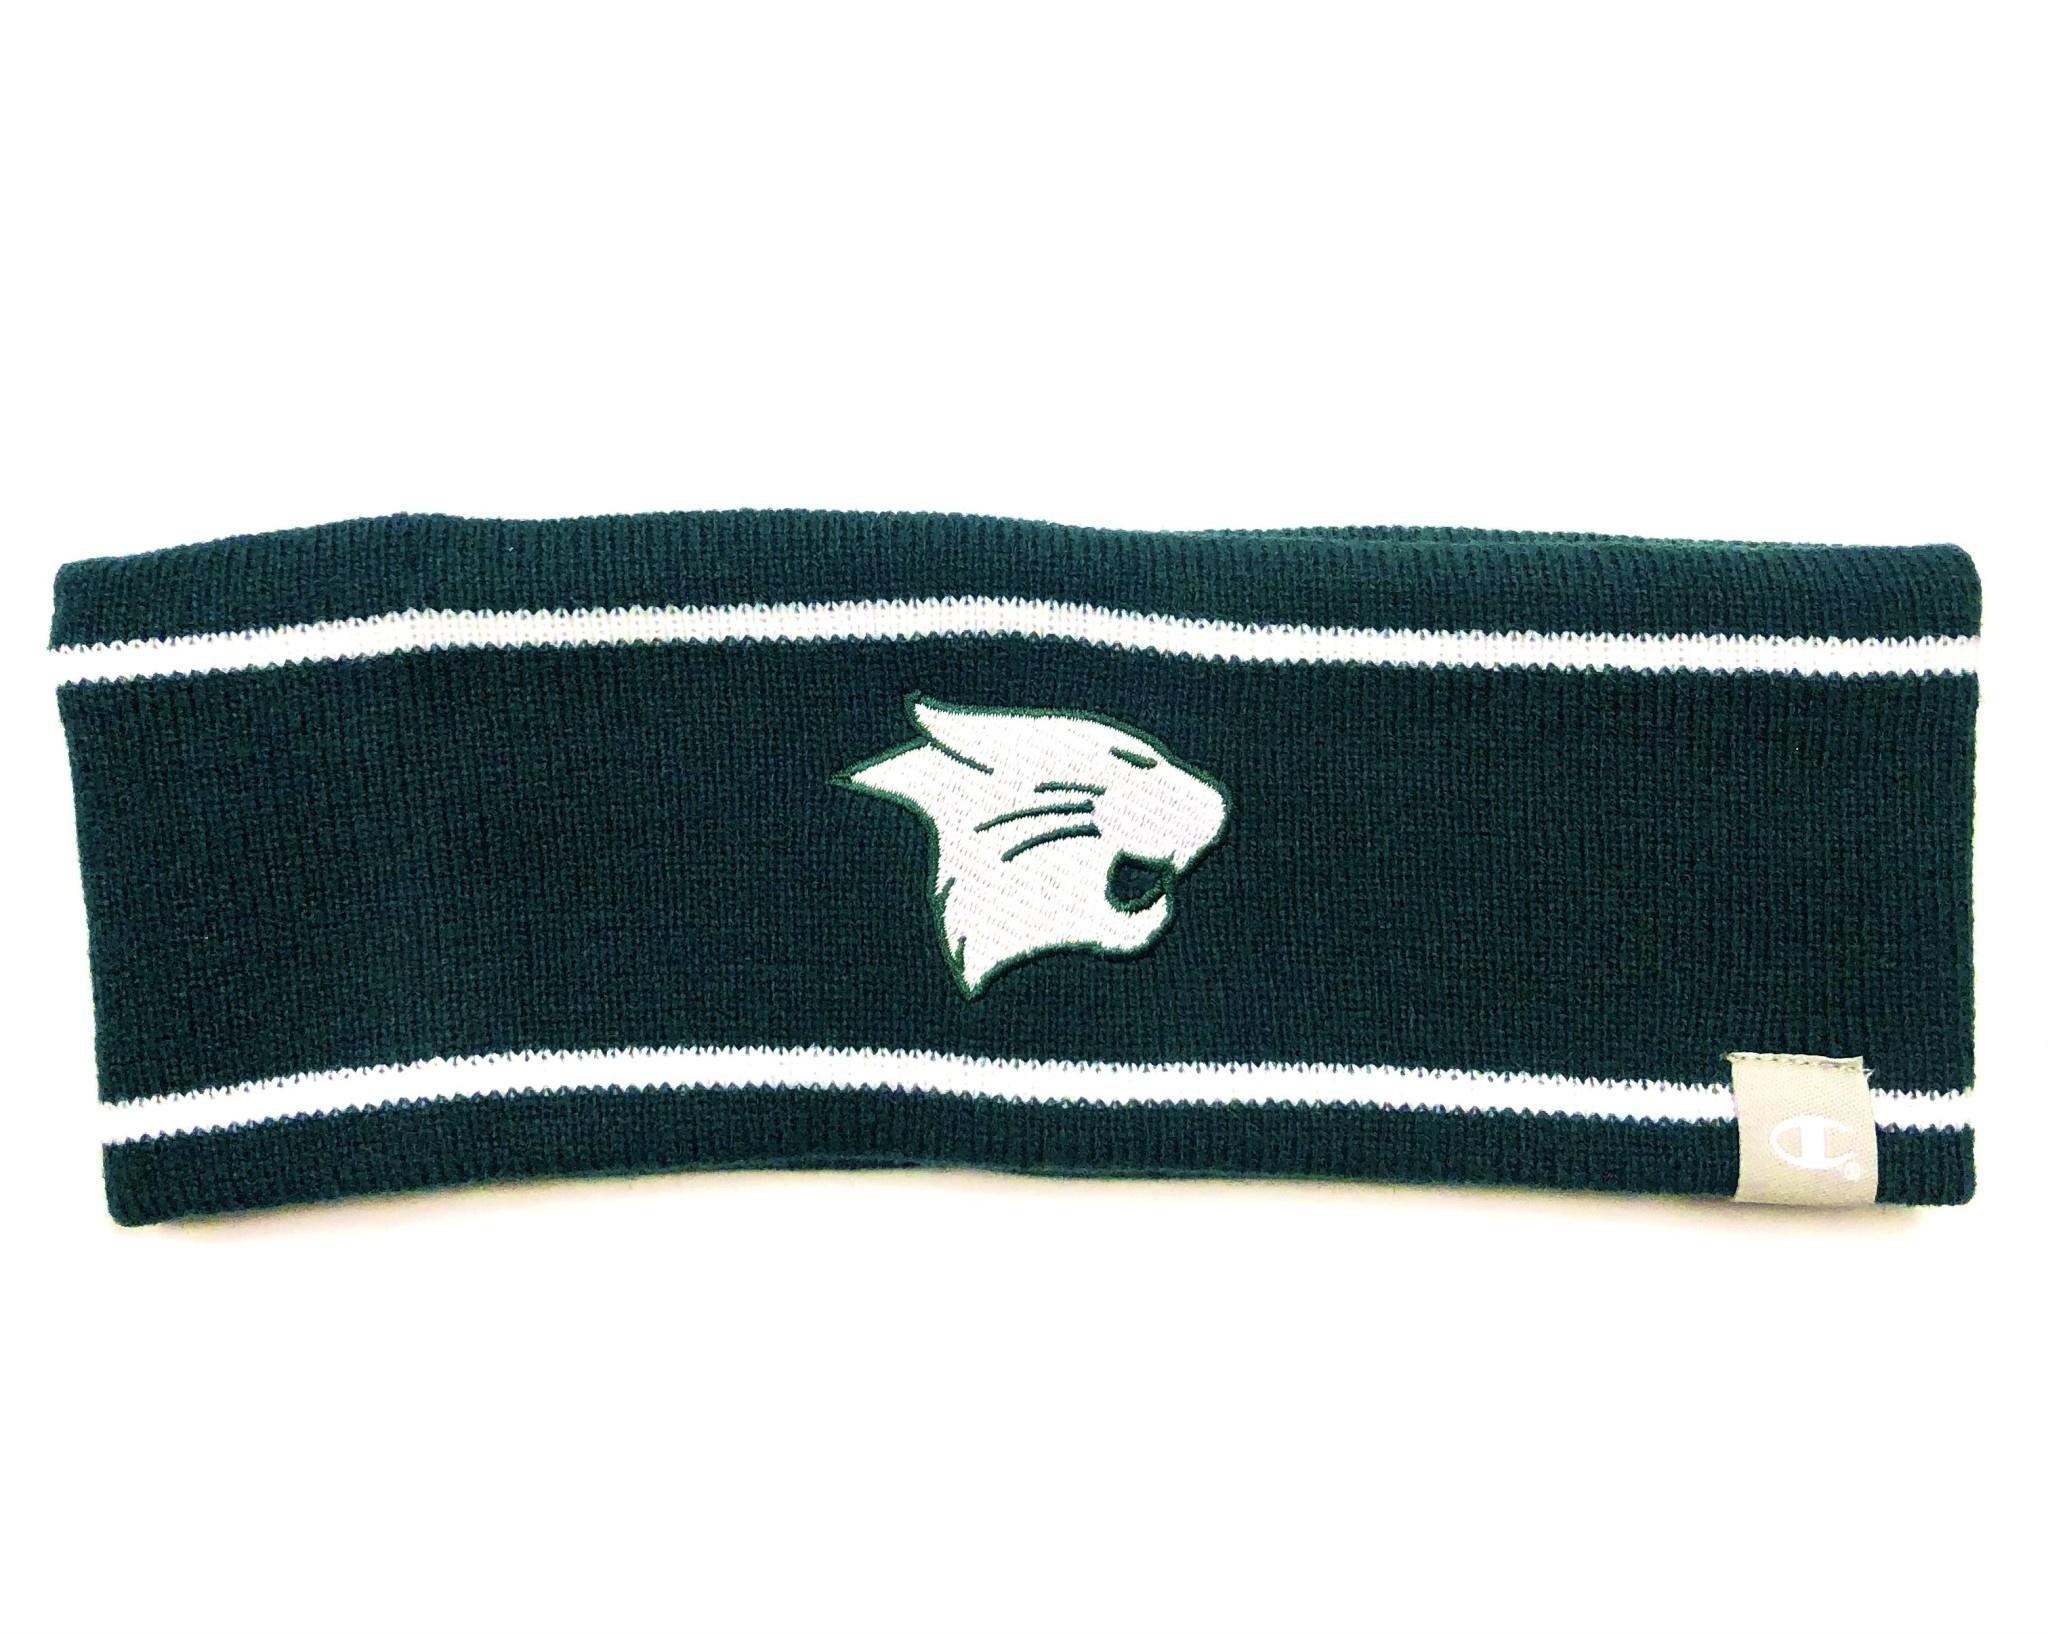 Champion Headband: Champion Knit Ski Band - Green/White